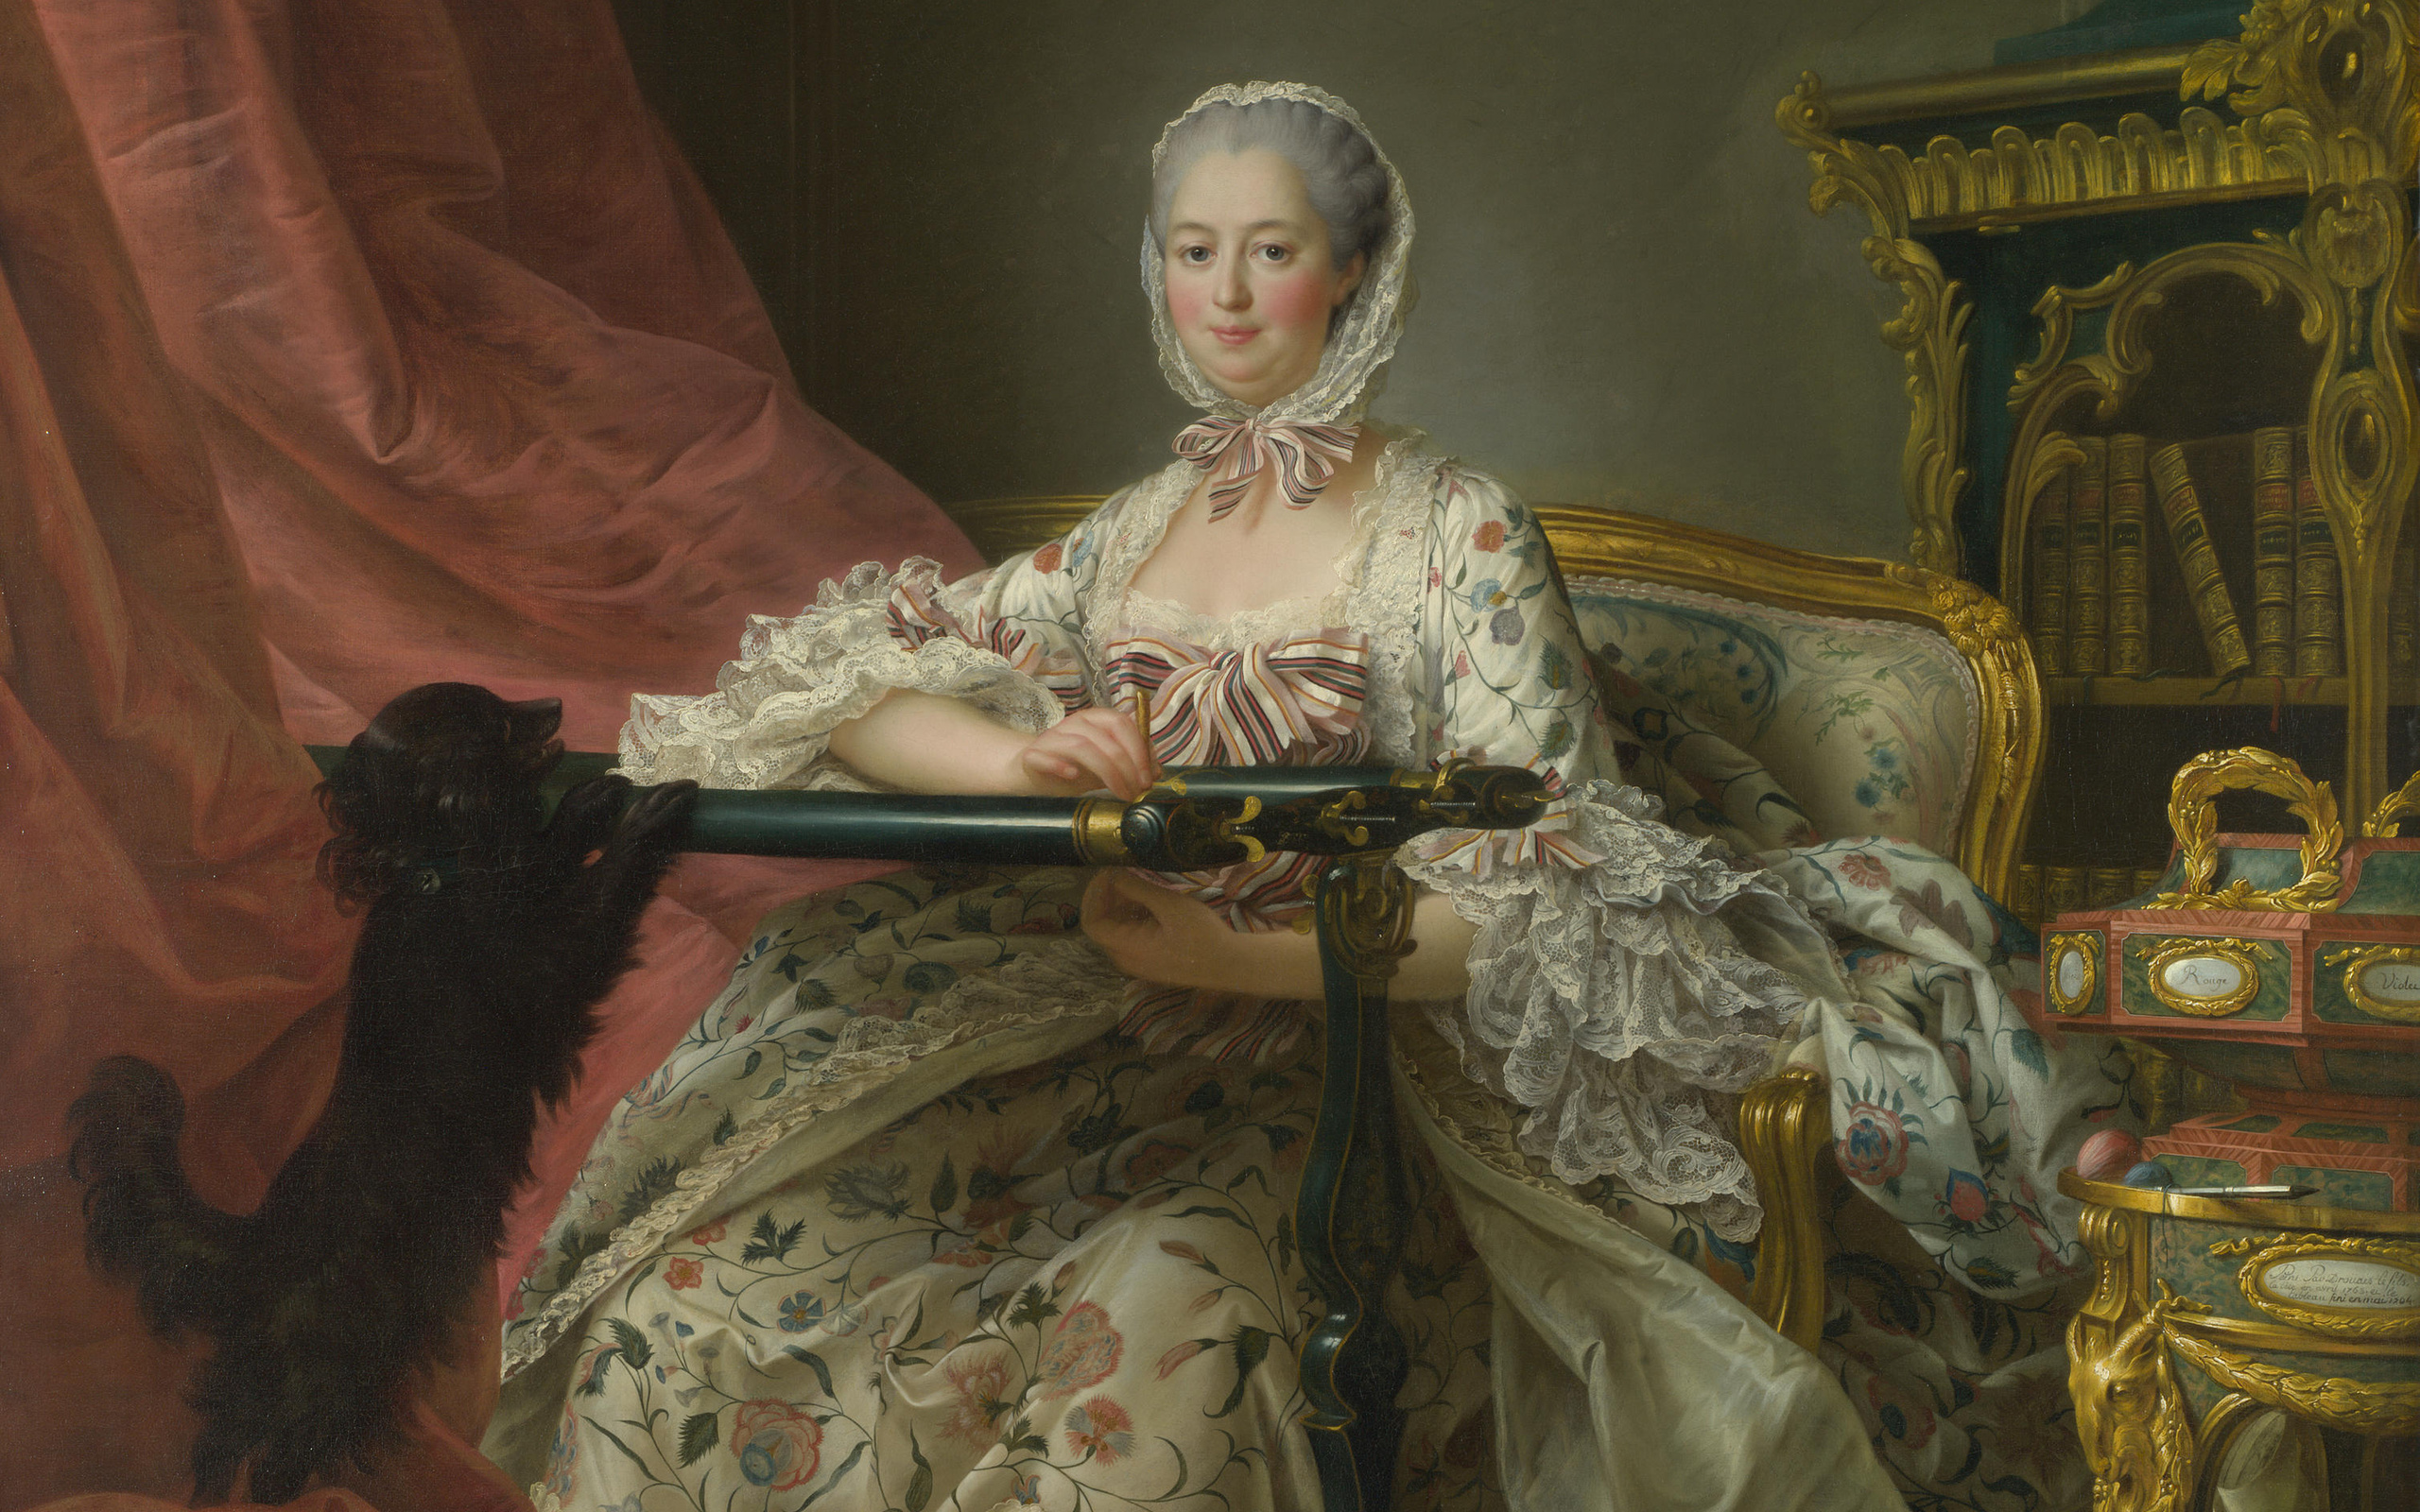 Лондонская Национальная галерея, мадам де Помпадур на нее Тамбур кадров, madame de pompadour at her tambour frame, Франсуа-Hubert Drouais, Francois-Hubert Drouais